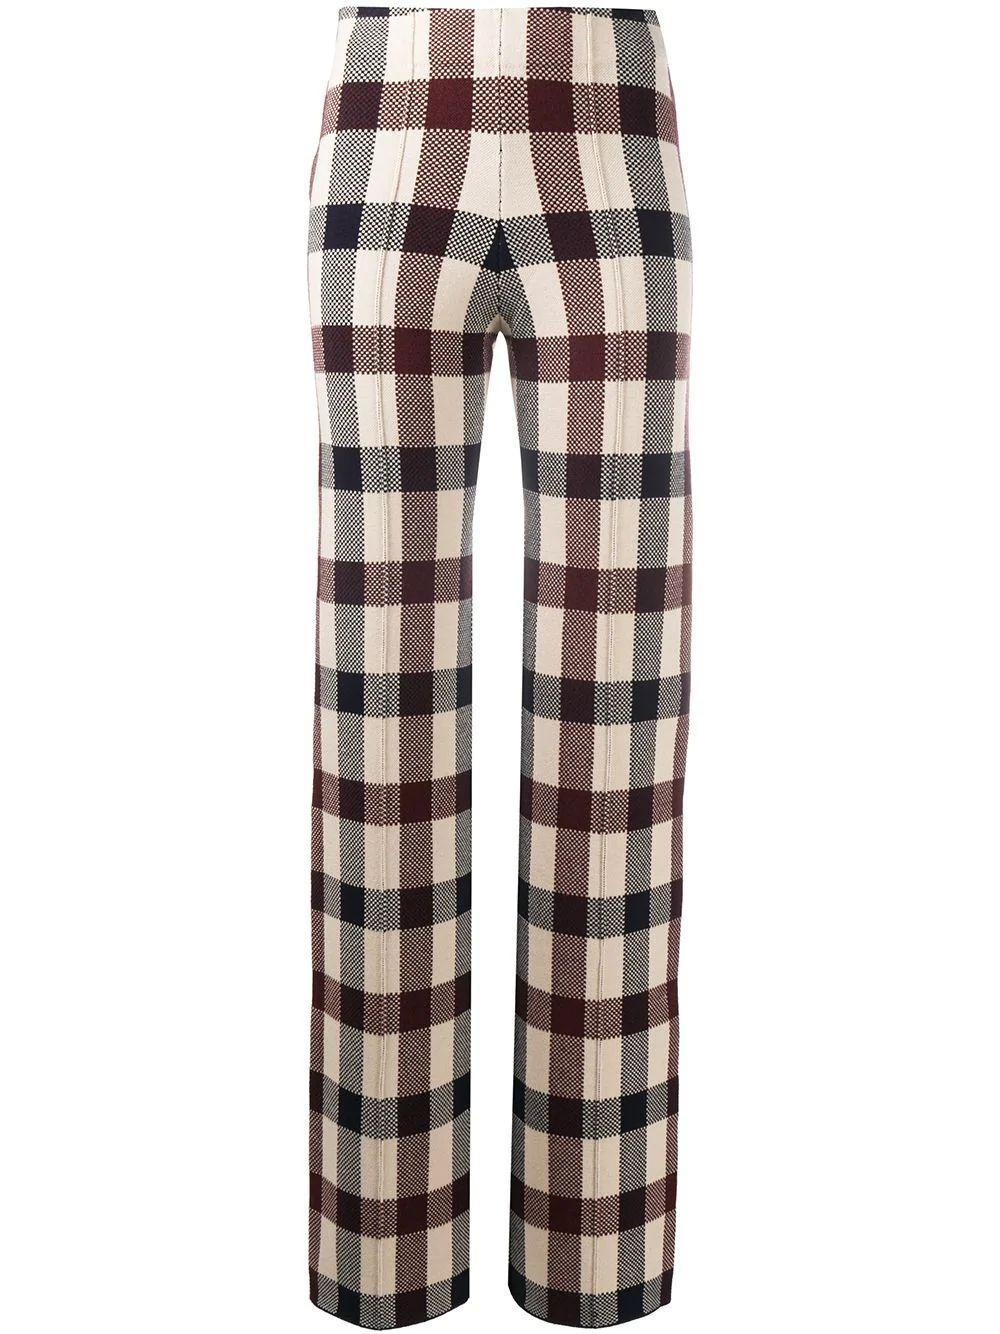 Plaid Trouser Item # 2320KTR001441A